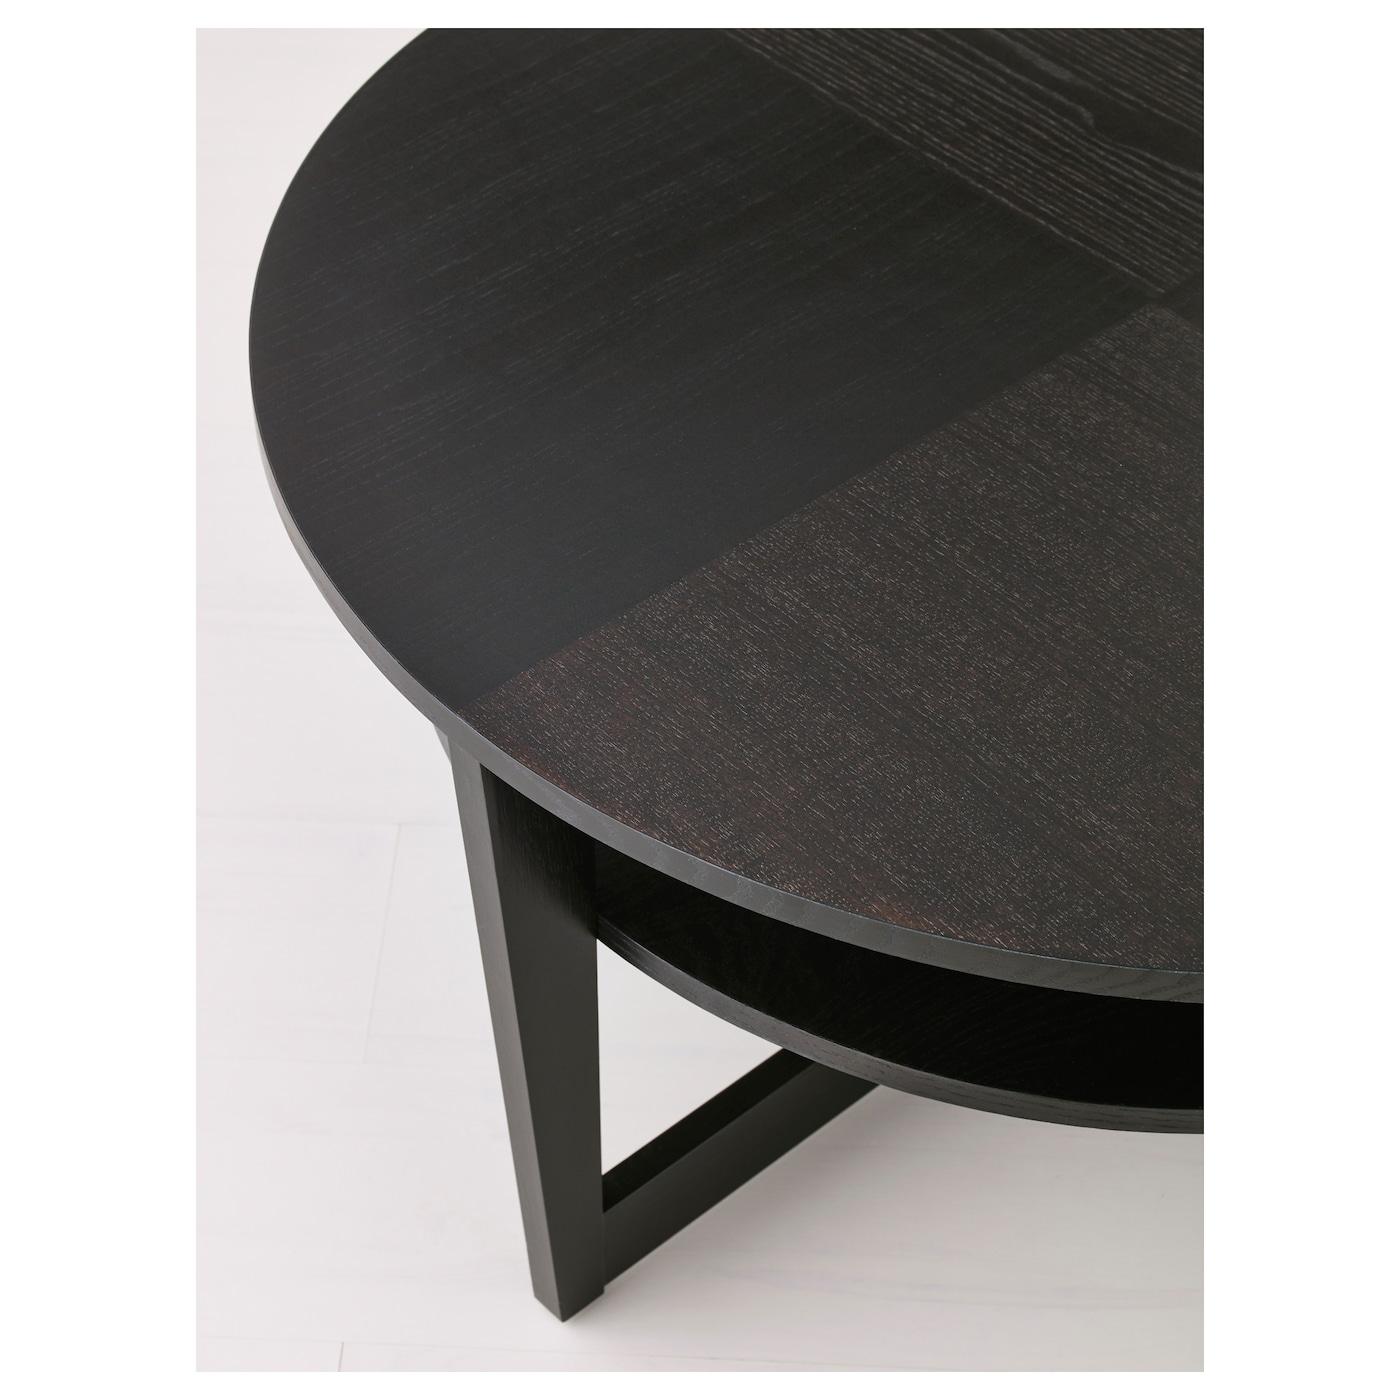 Vejmon Coffee Table Black Brown 90 Cm Ikea [ 1400 x 1400 Pixel ]